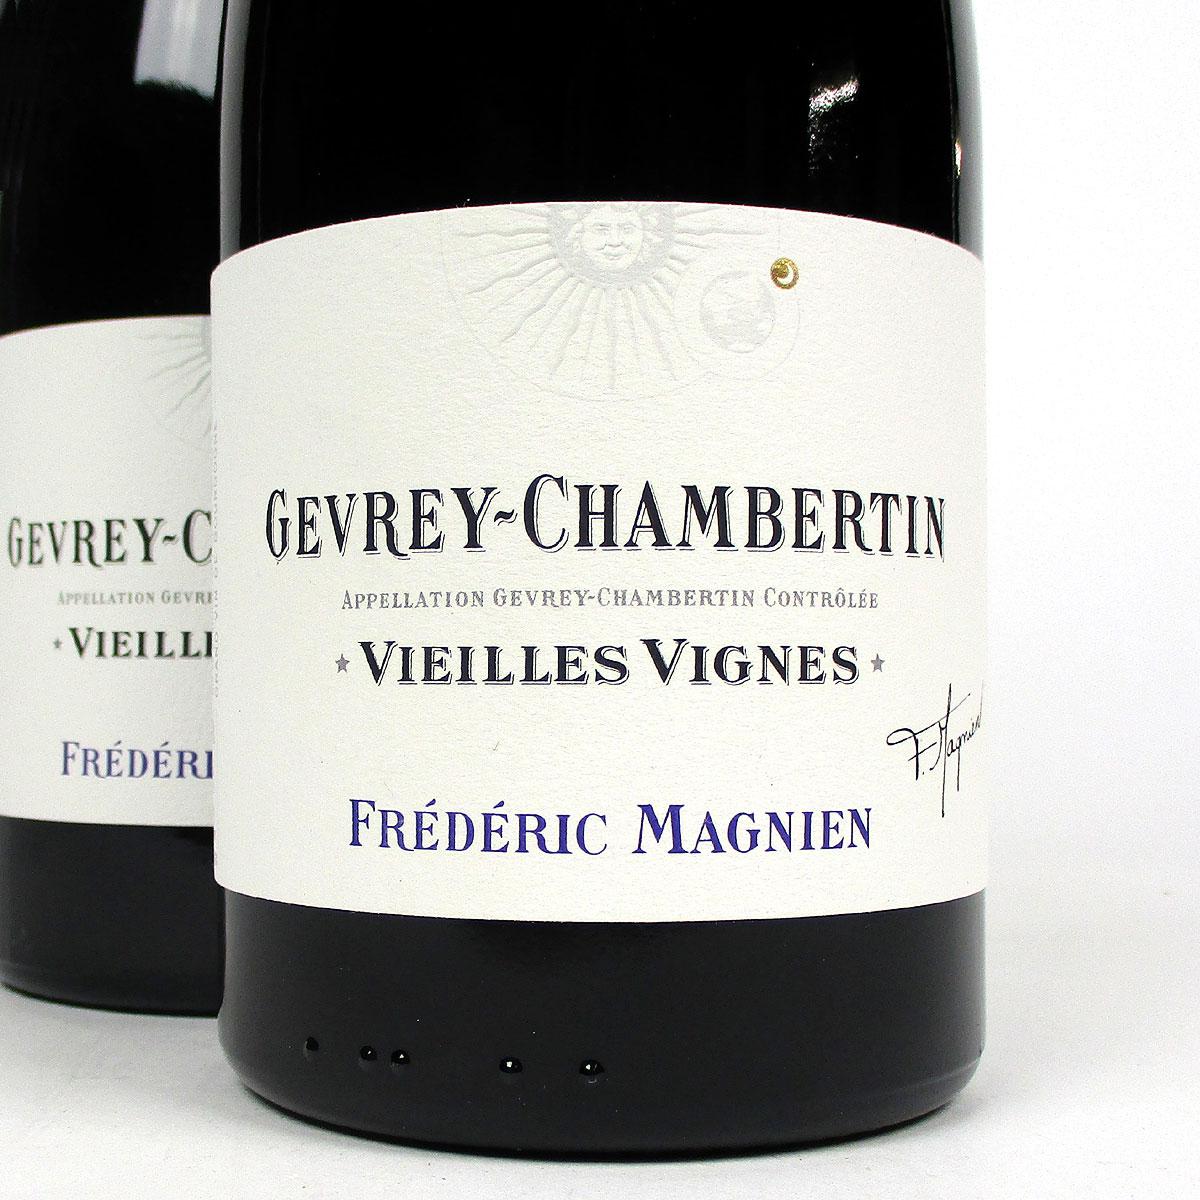 Gevrey-Chambertin: Frédéric Magnien 'Vieilles Vignes' 2017